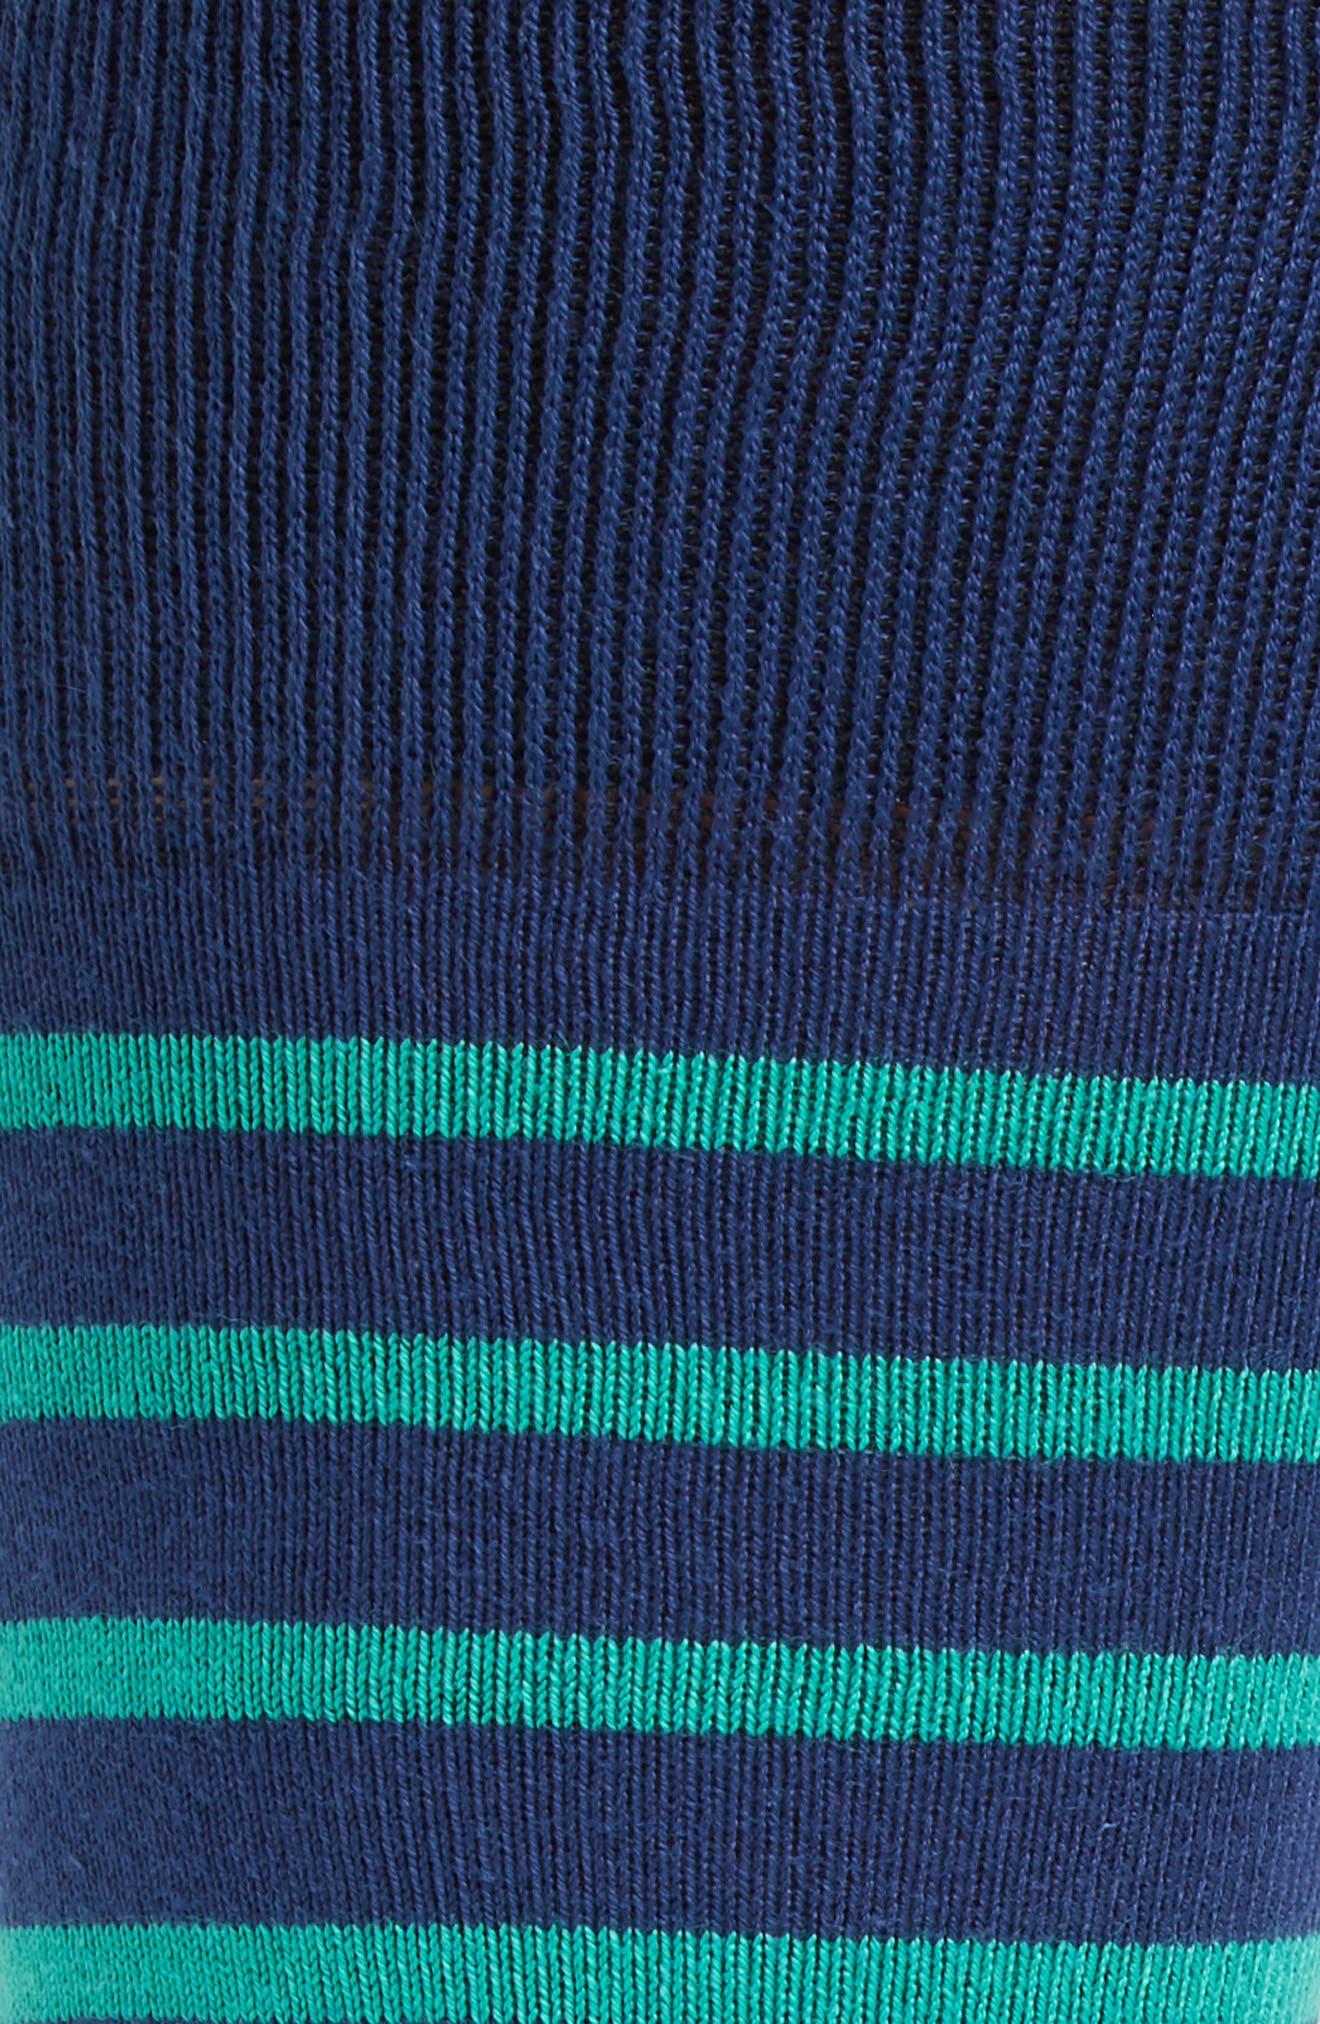 Ray Stripe Socks,                             Alternate thumbnail 2, color,